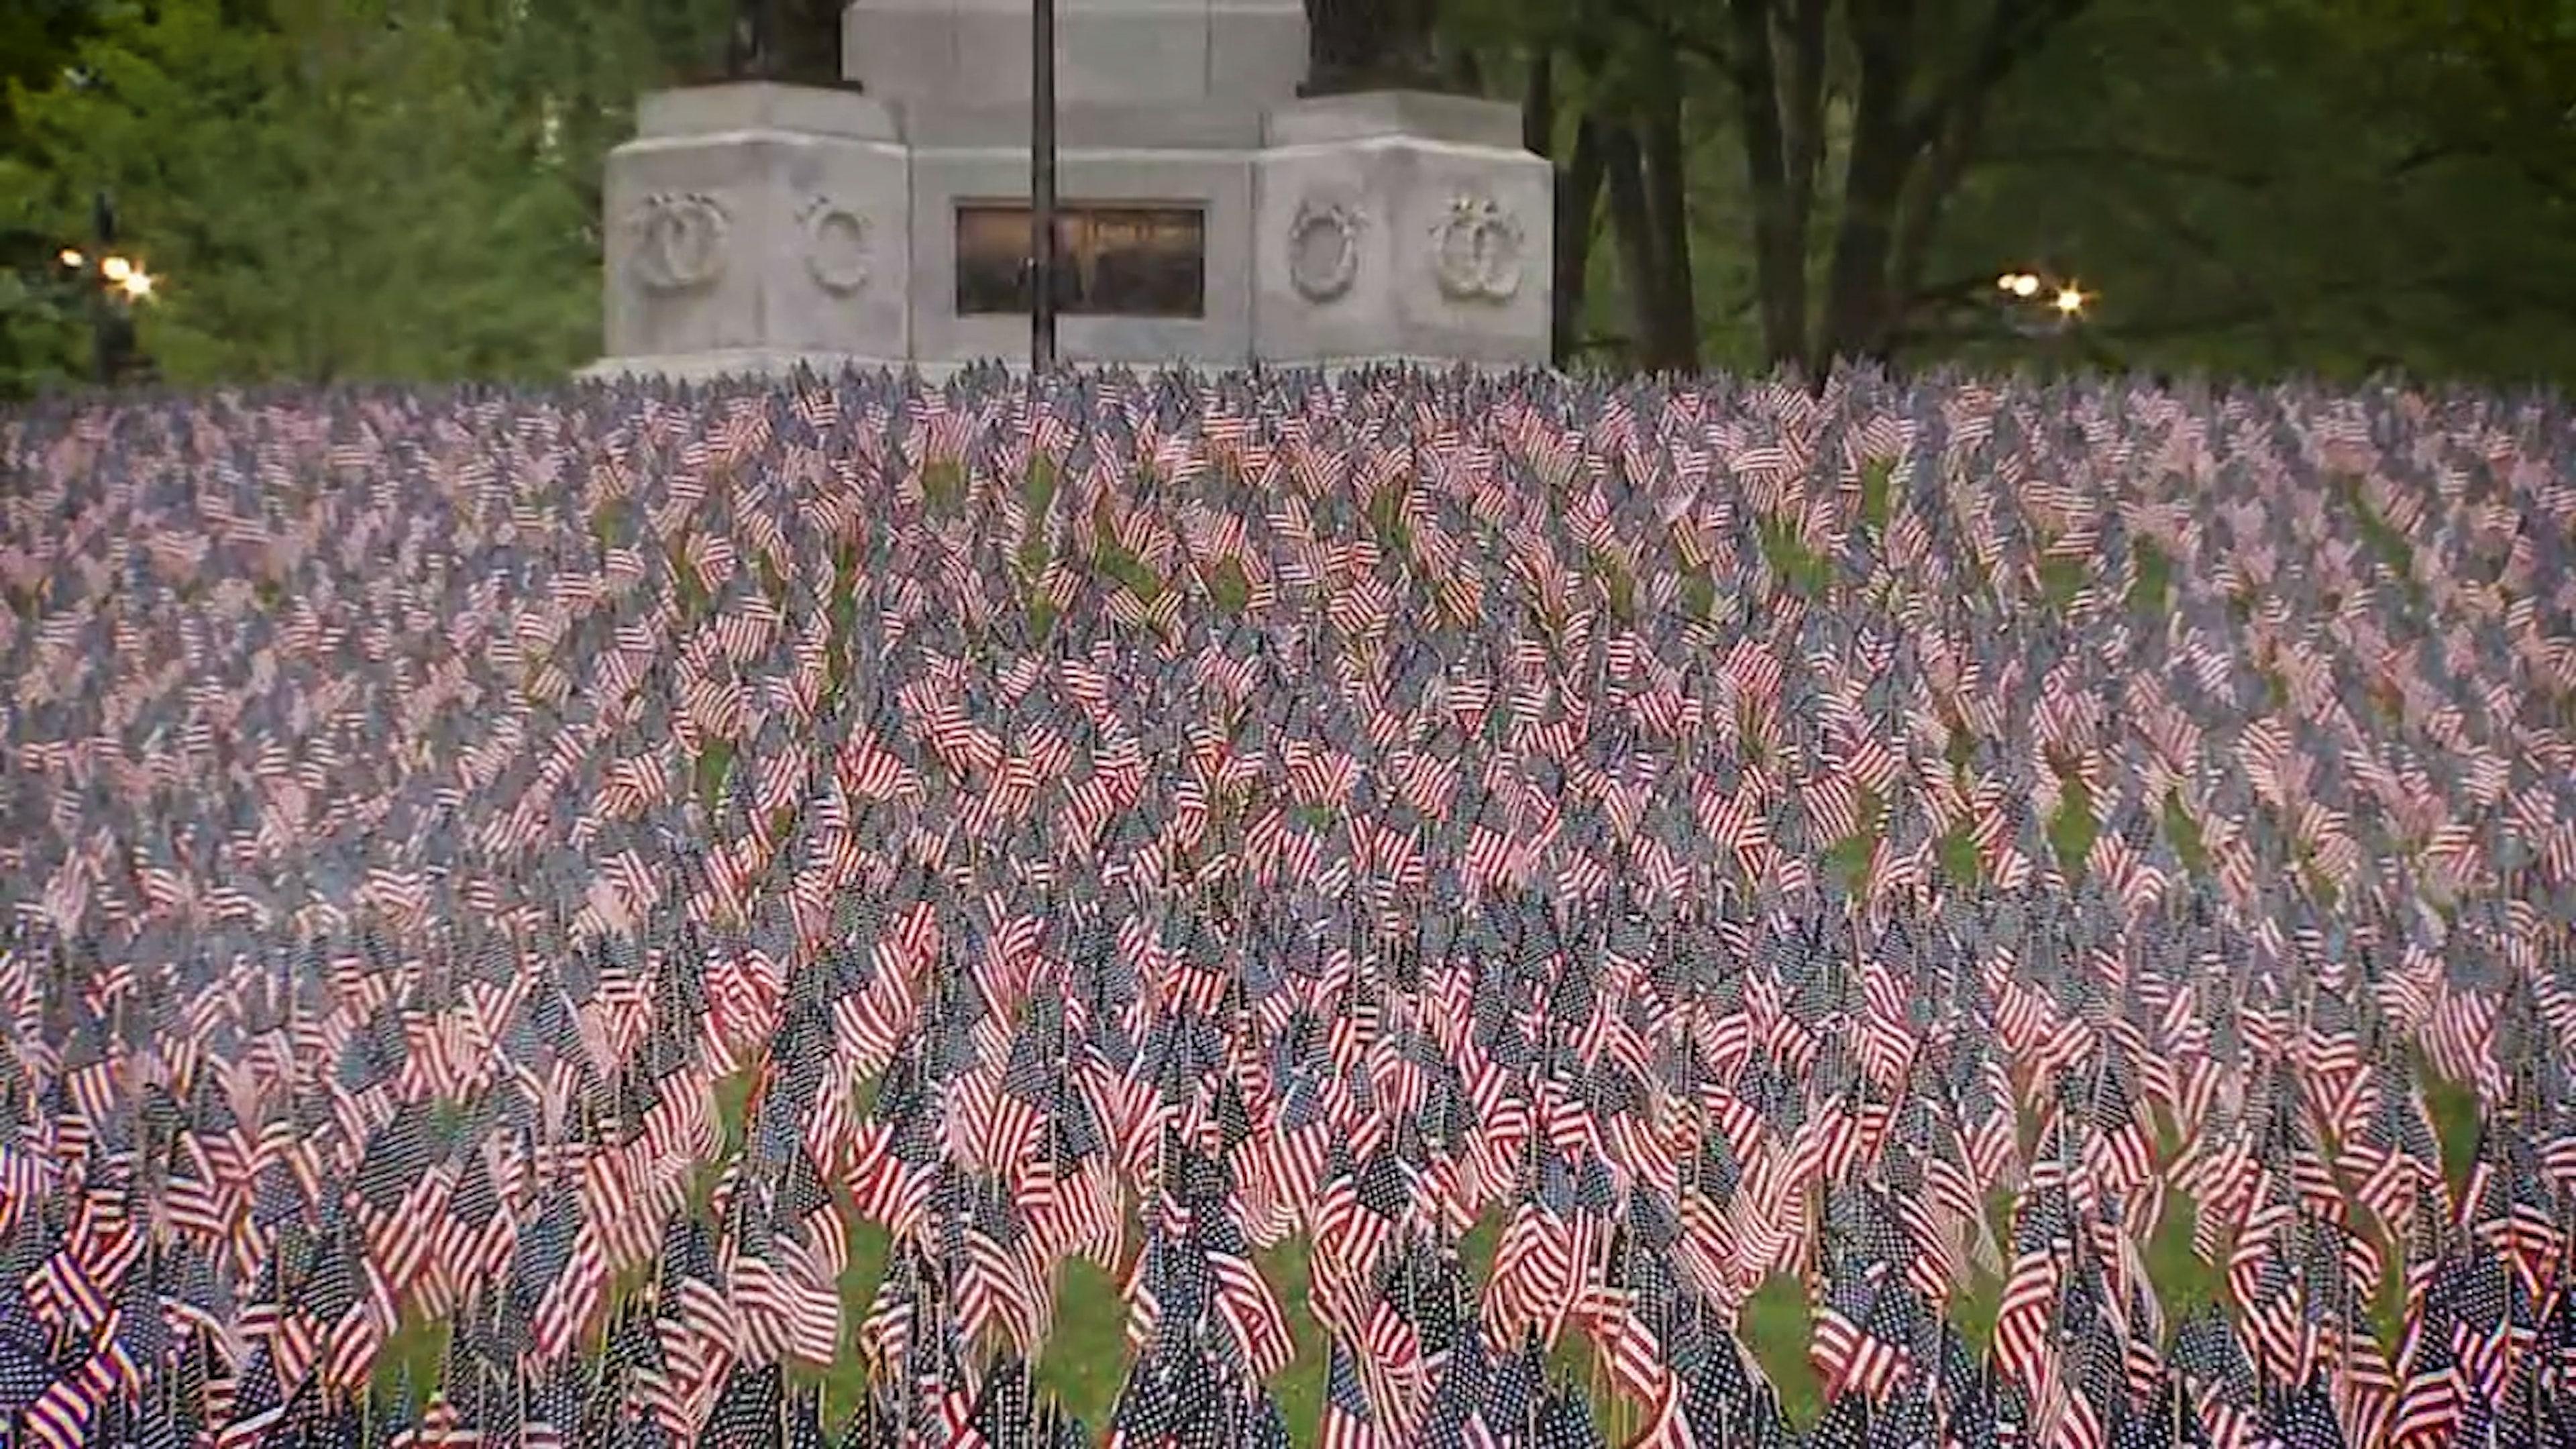 Boston's Memorial Day flag garden tradition lives on despite pandemic